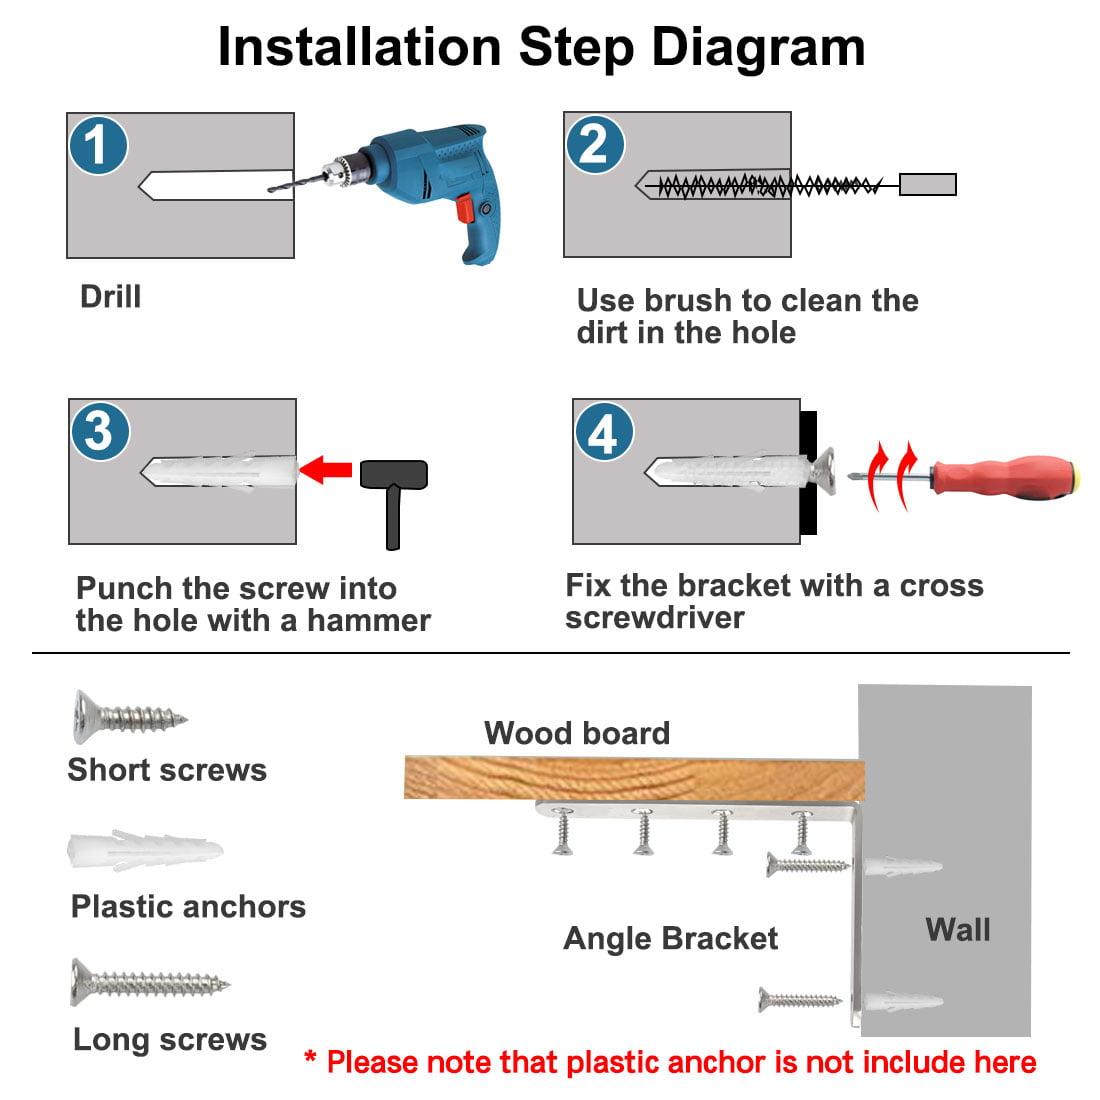 Angle Brackets Stainless Steel Brace Fastener Support w Screws 125 x 75mm, 4pcs - image 1 de 7